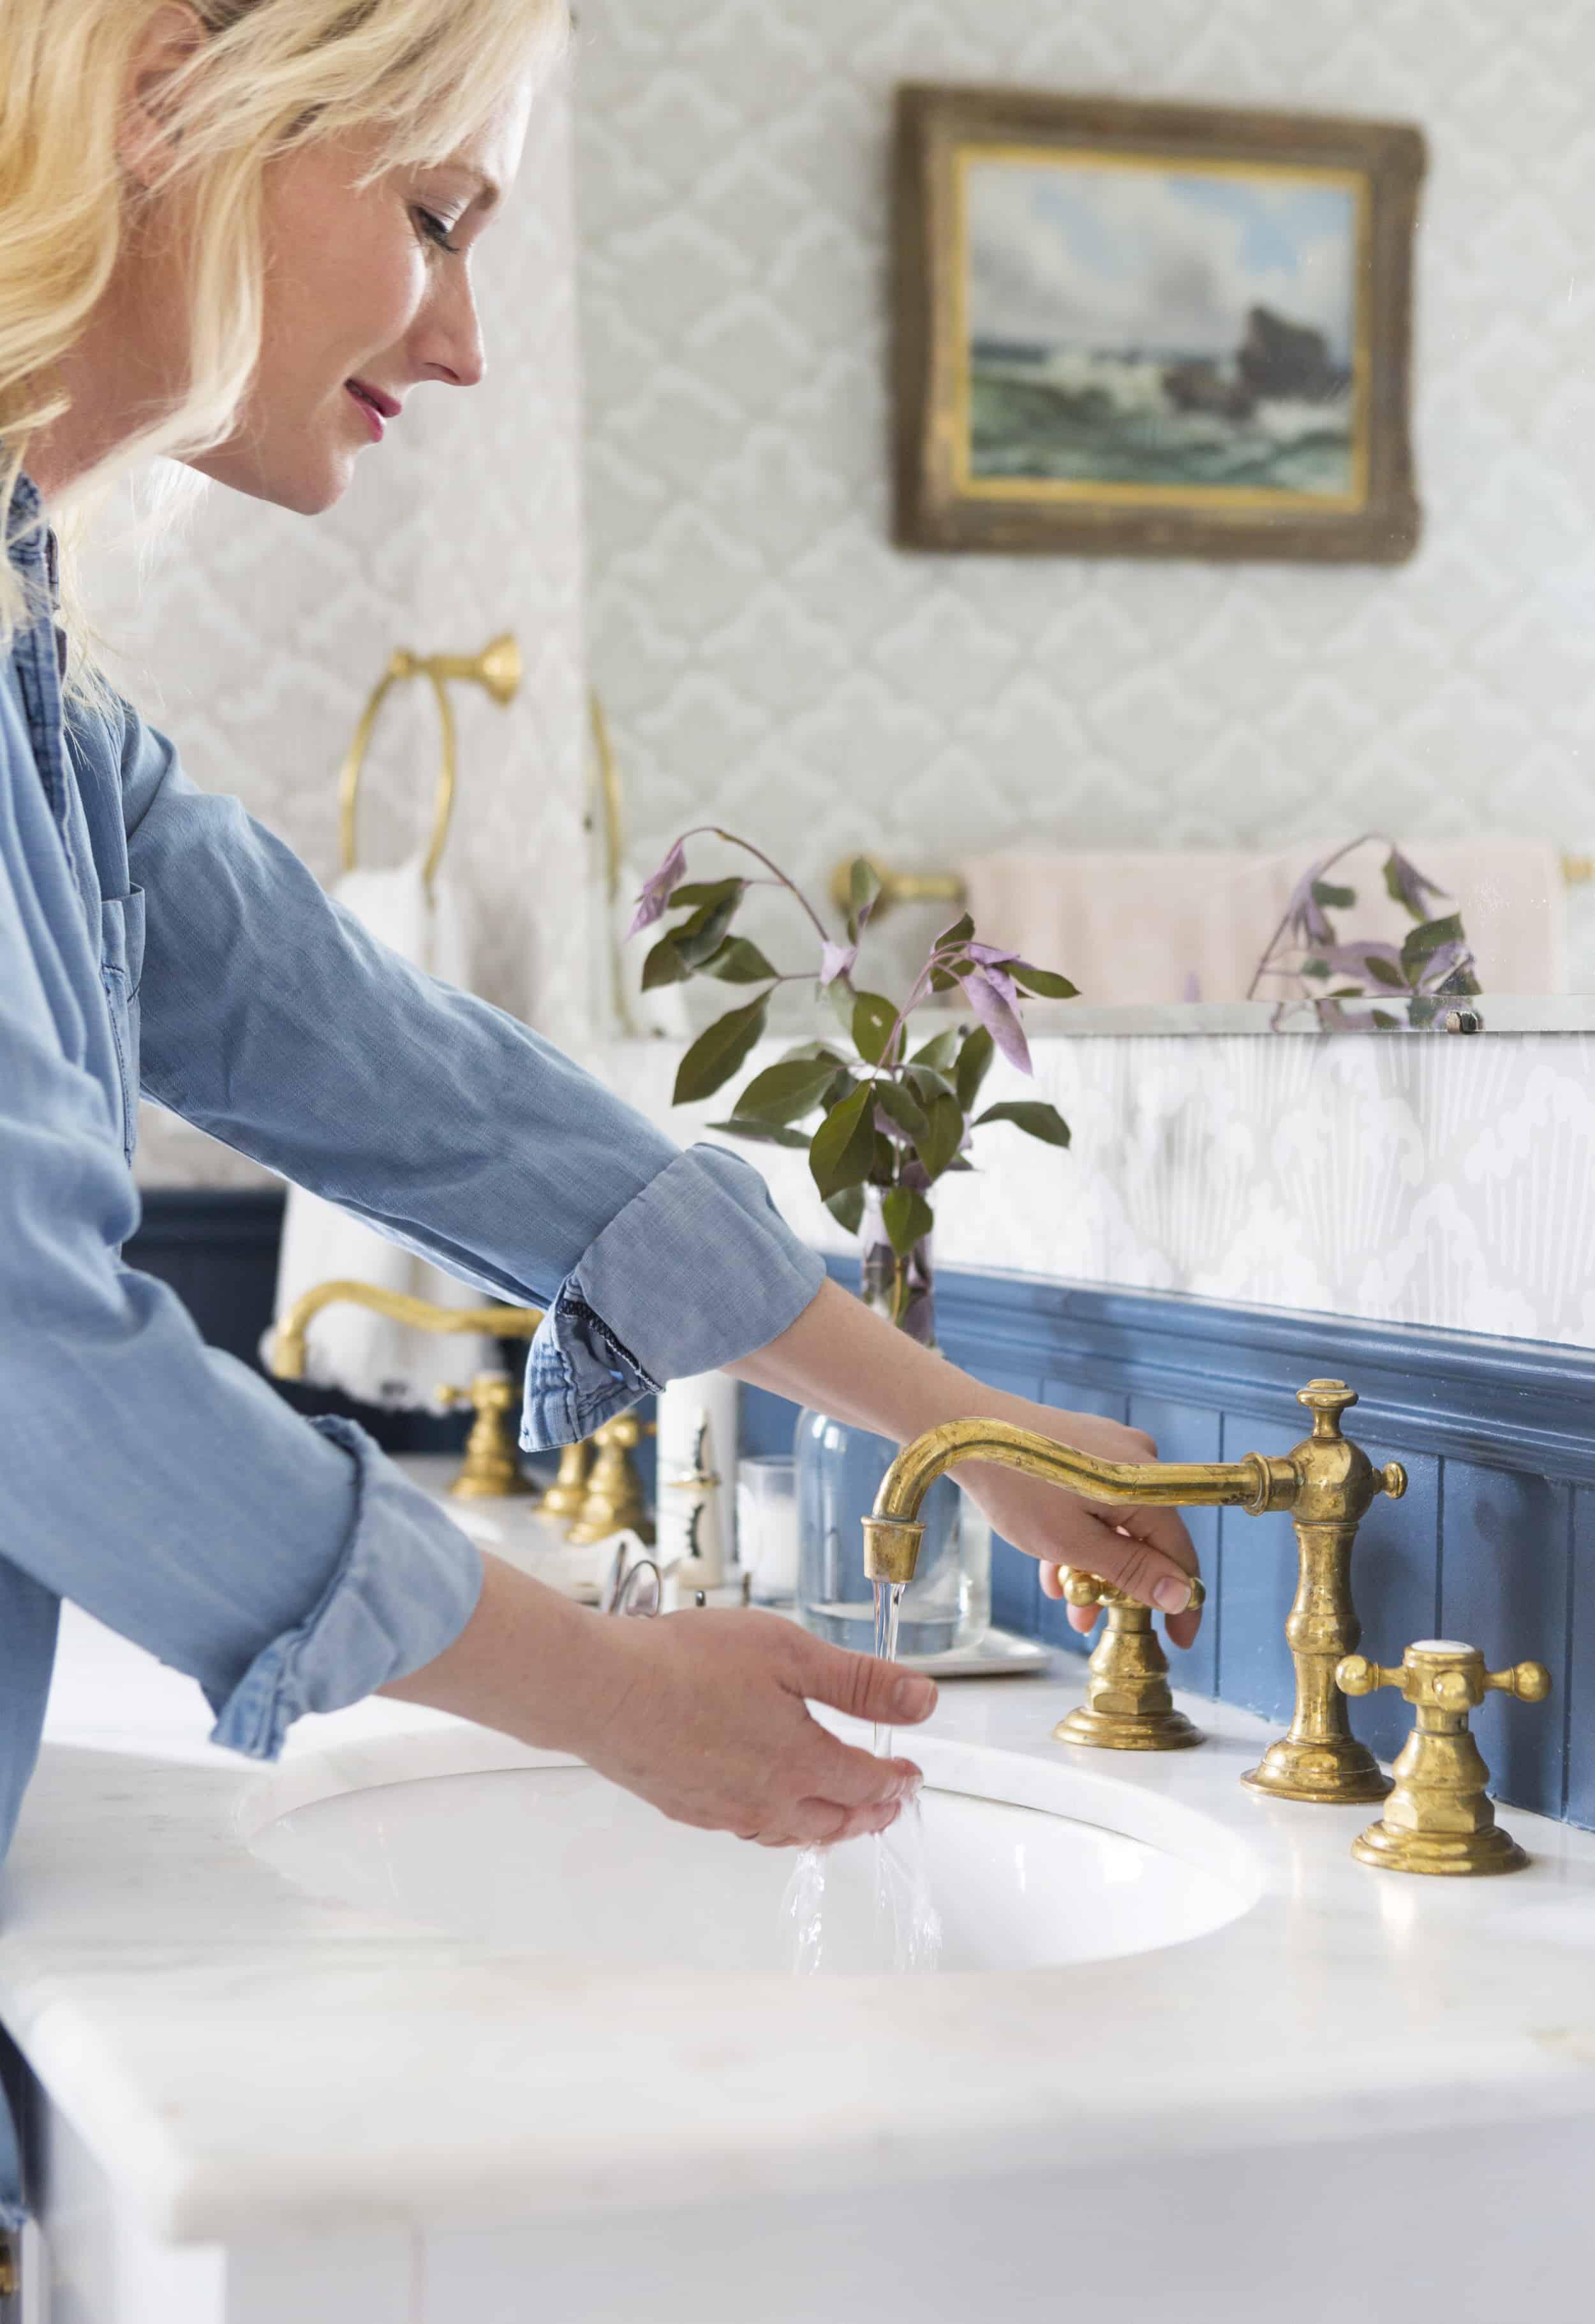 Emily Henderson Culligan Water Softner Benefits 10